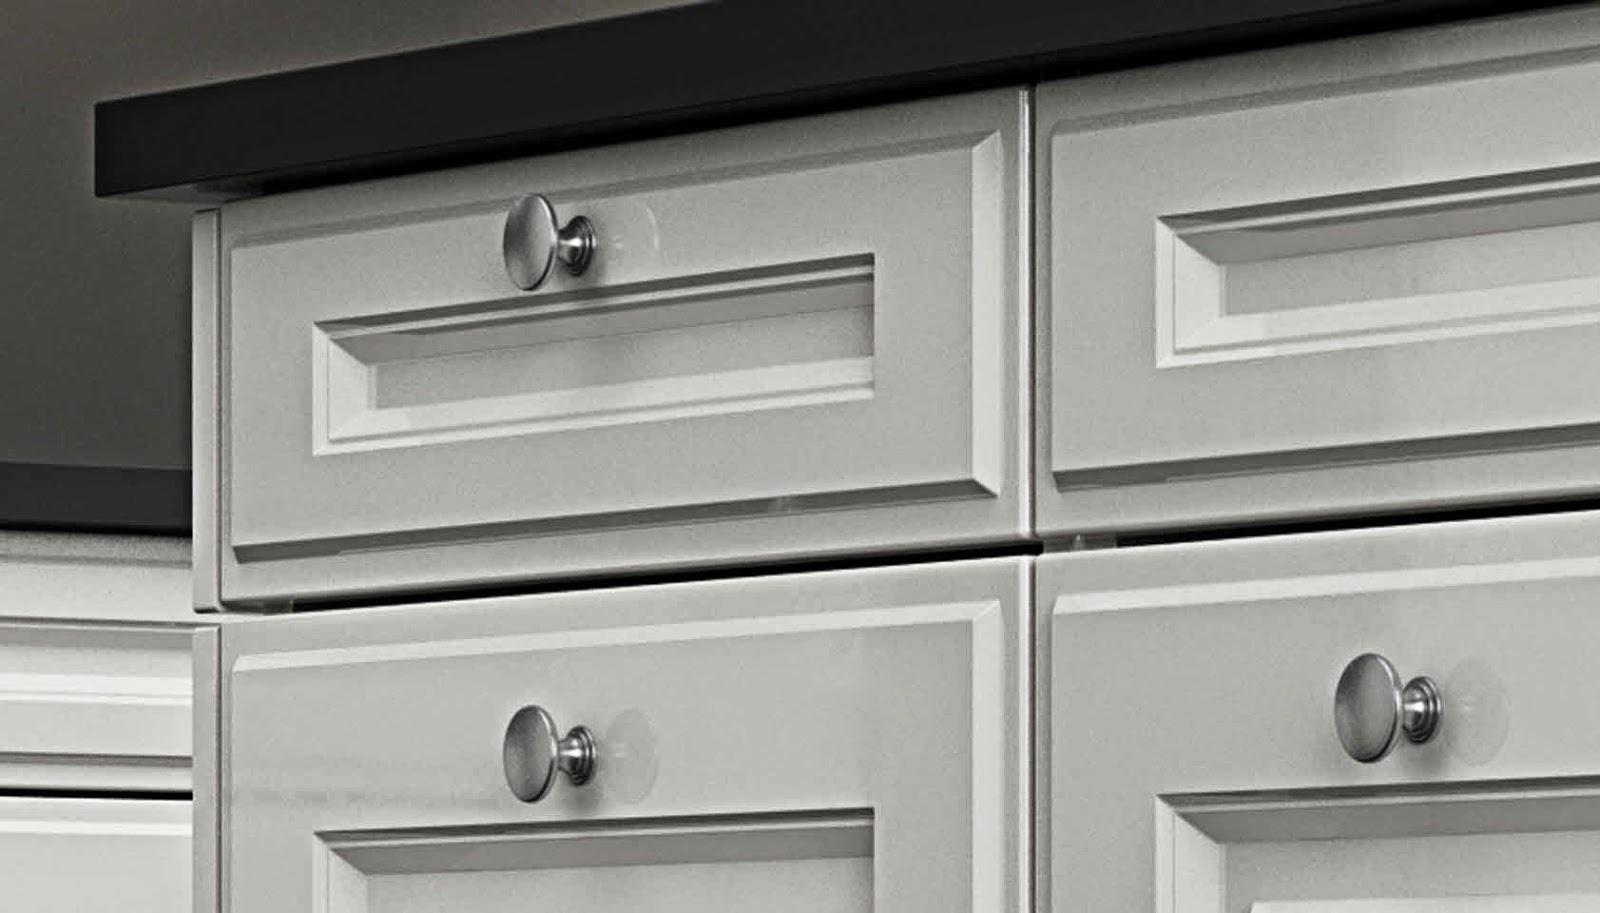 Tiradores de cocina peque os y necesarios accesorios cocinas con estilo - Tiradores de puertas de cocina ...